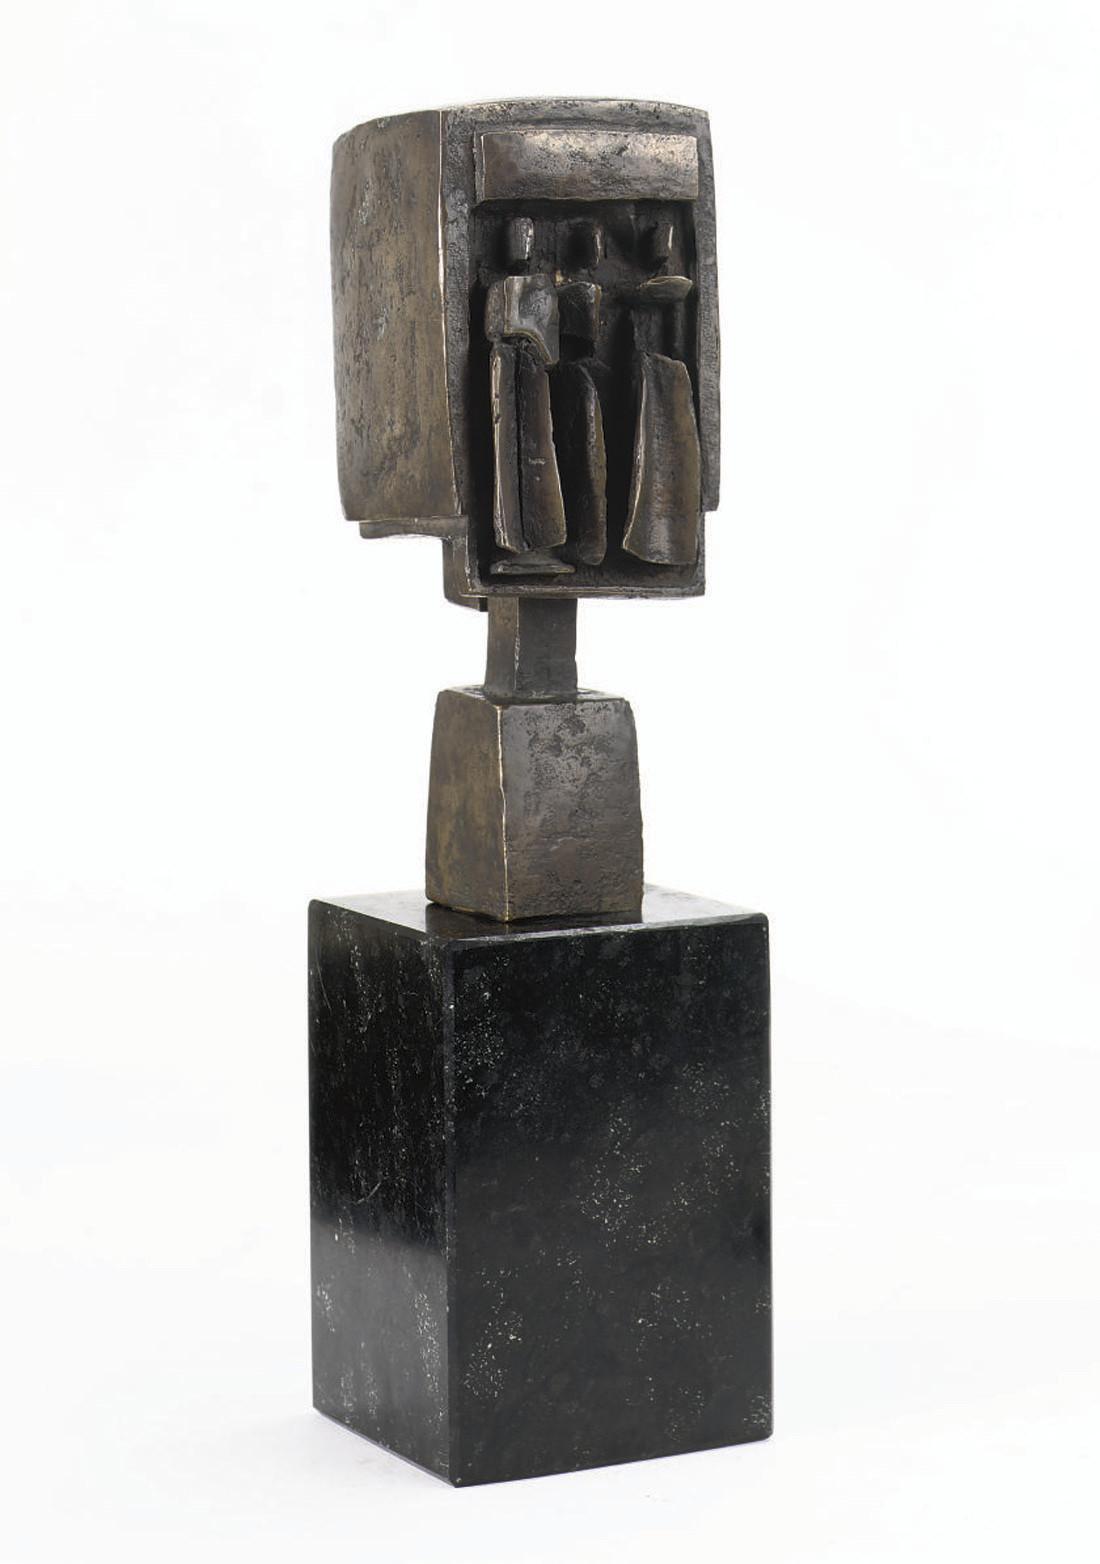 Mario Negri (ITALIAN, 1916-198